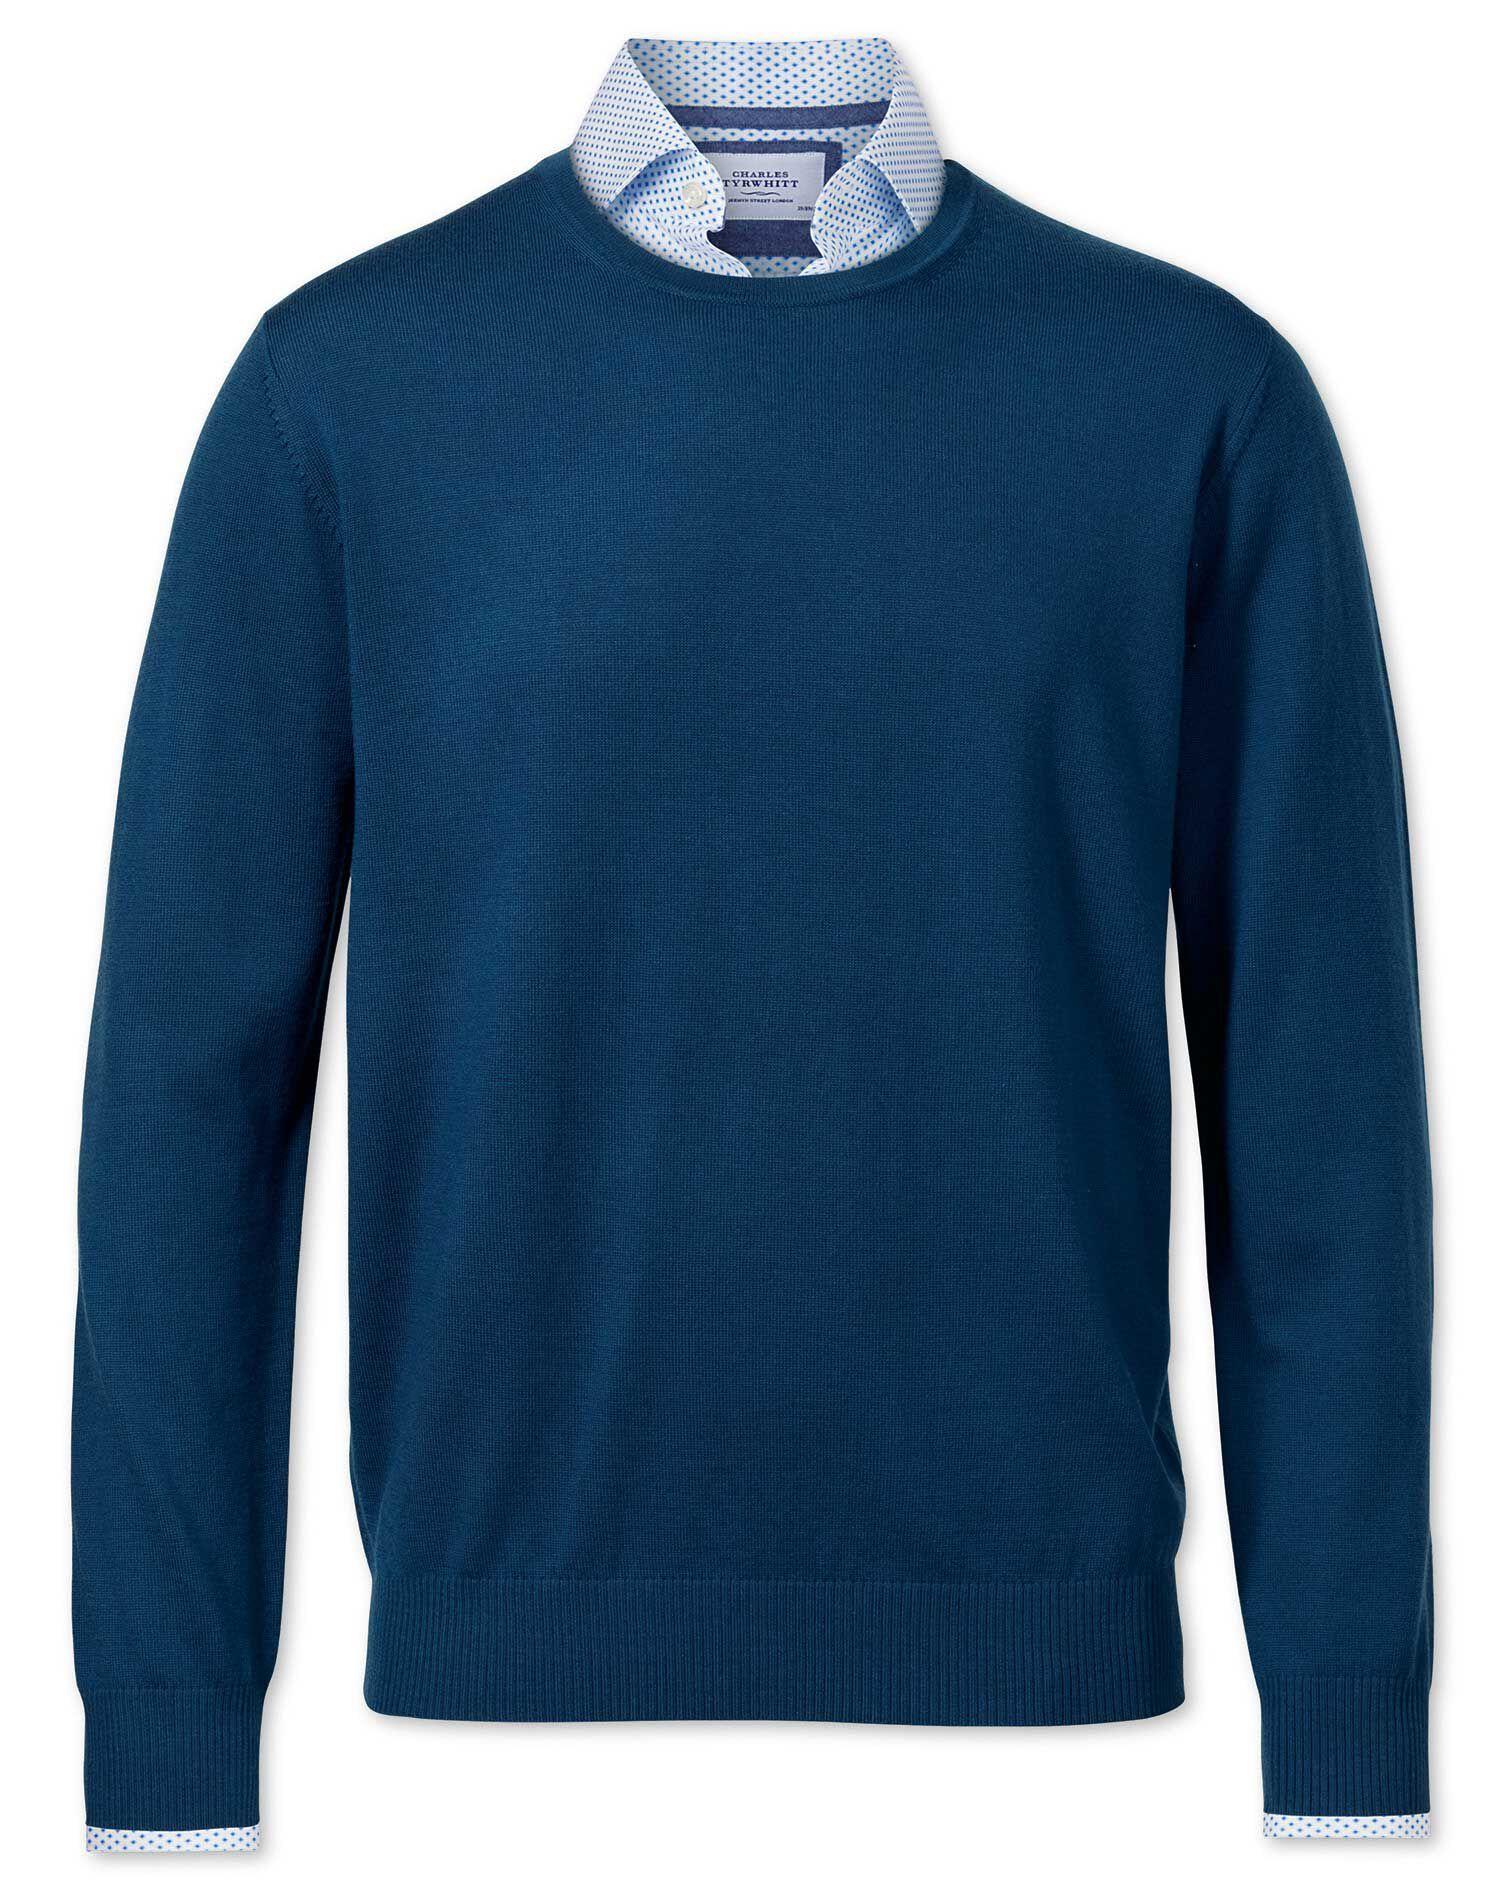 Blue Merino Wool Crew Neck Jumper Size XXL by Charles Tyrwhitt